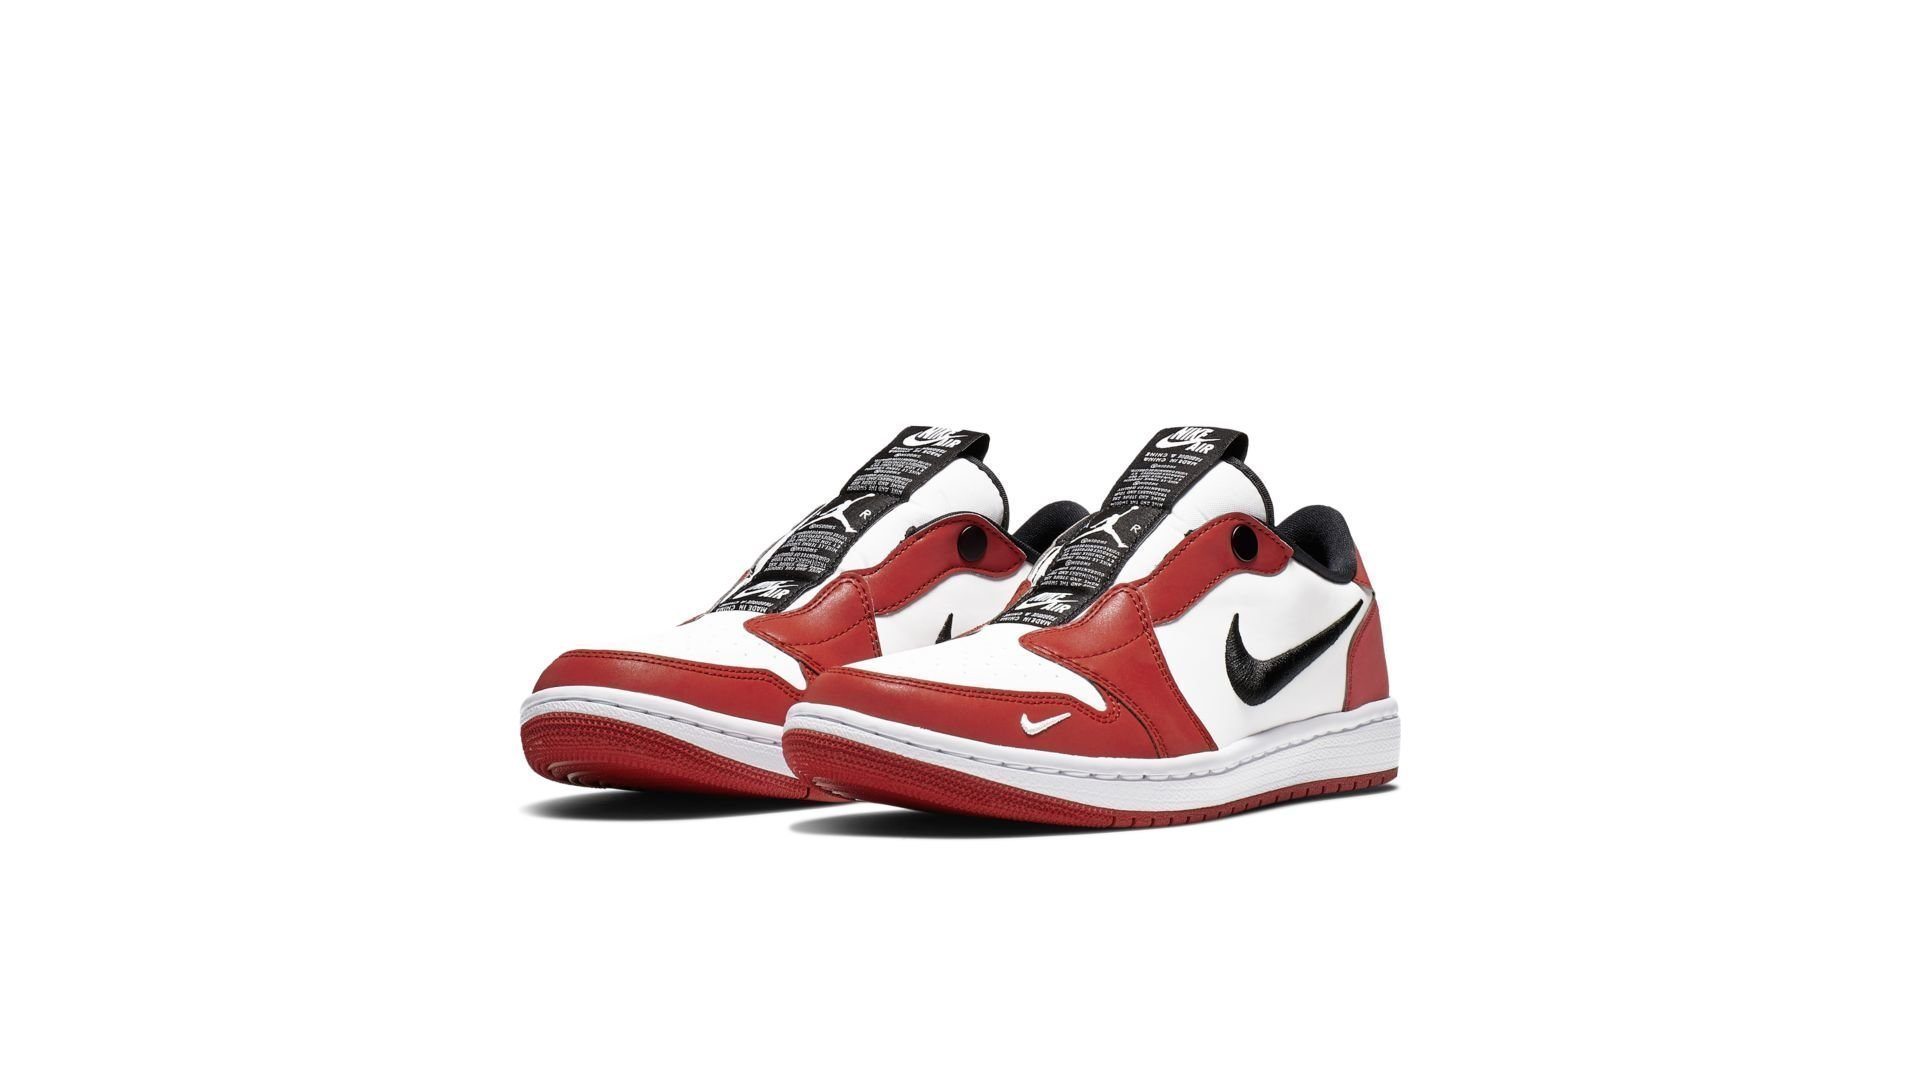 Jordan 1 Retro Low Slip Chicago (W) (BQ8462-601)